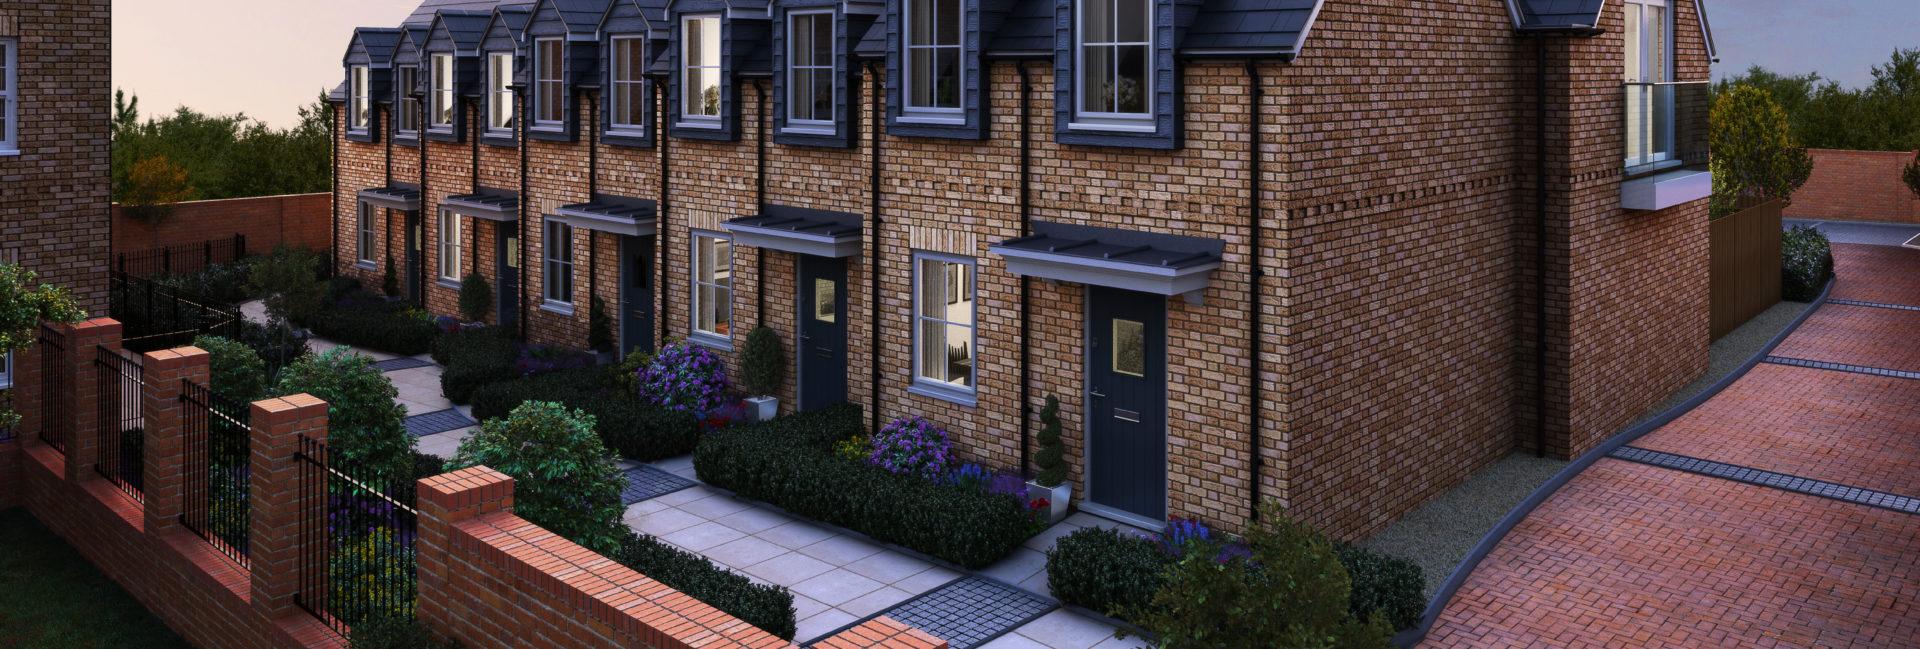 Ambassador Square Cheshunt Refurb into 4 apartments and 7 new homes